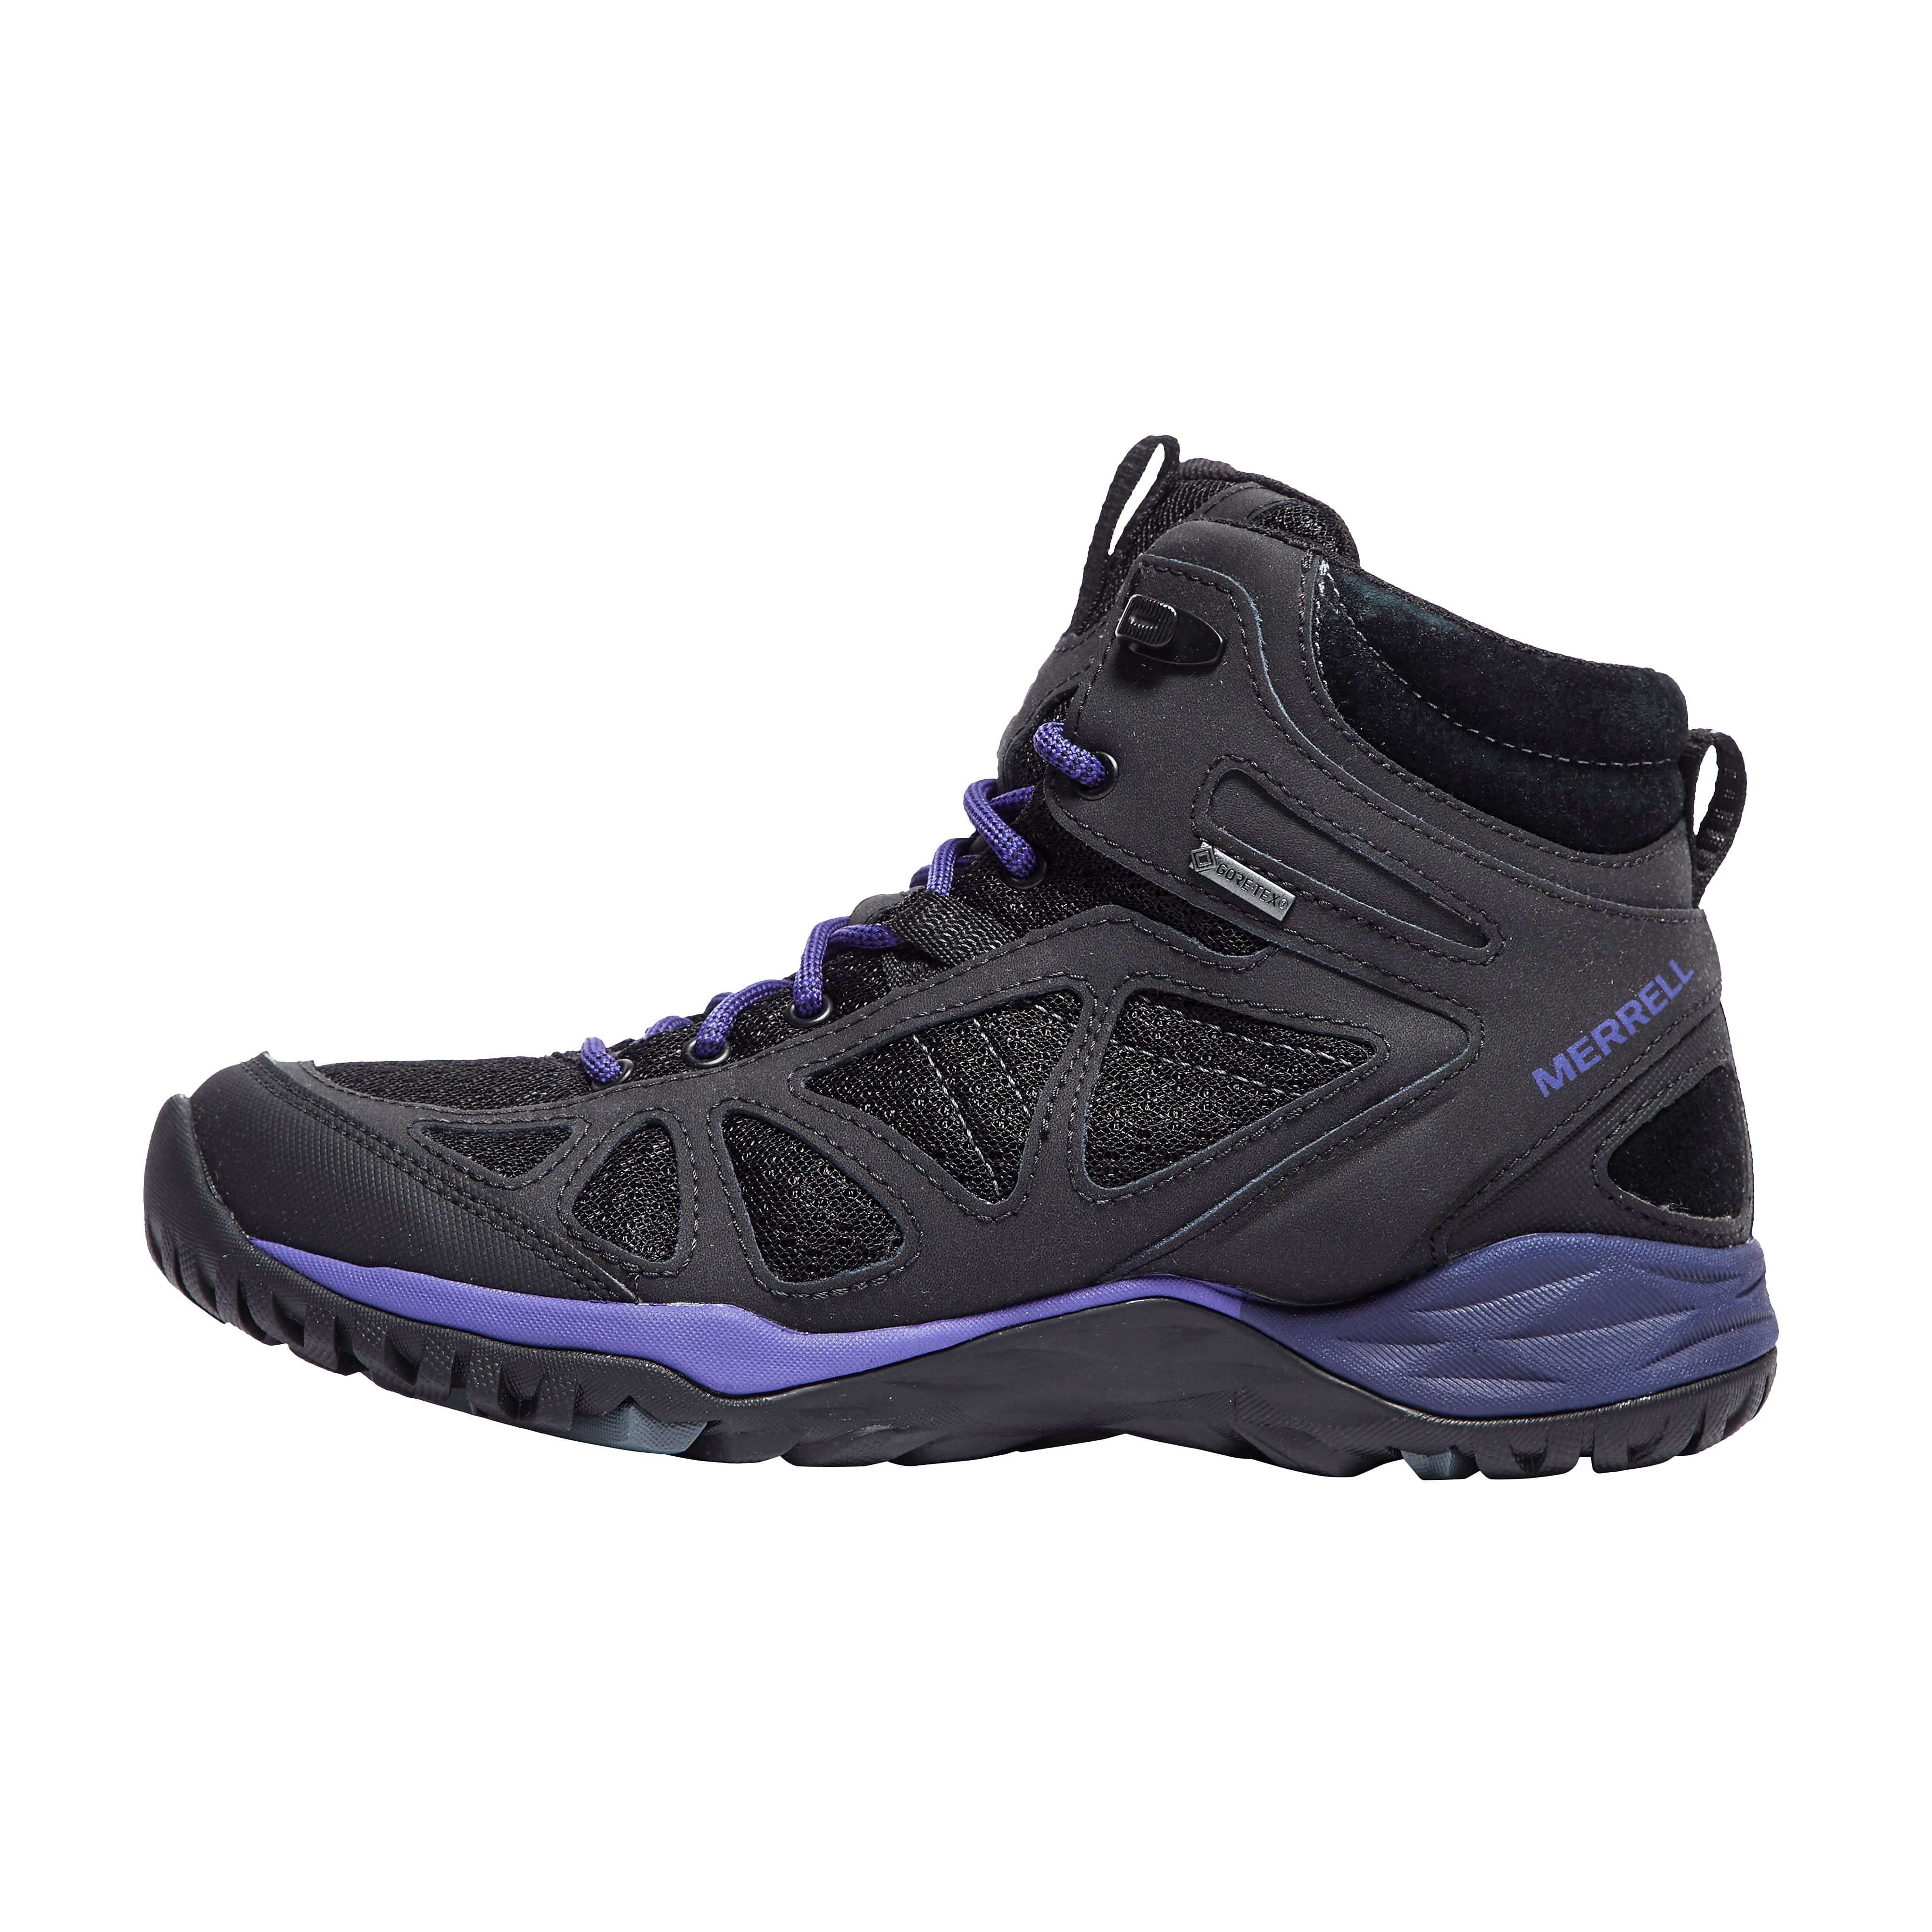 Merrell Siren Sport Q2 Mid Gore-Tex Women's Walking Boots